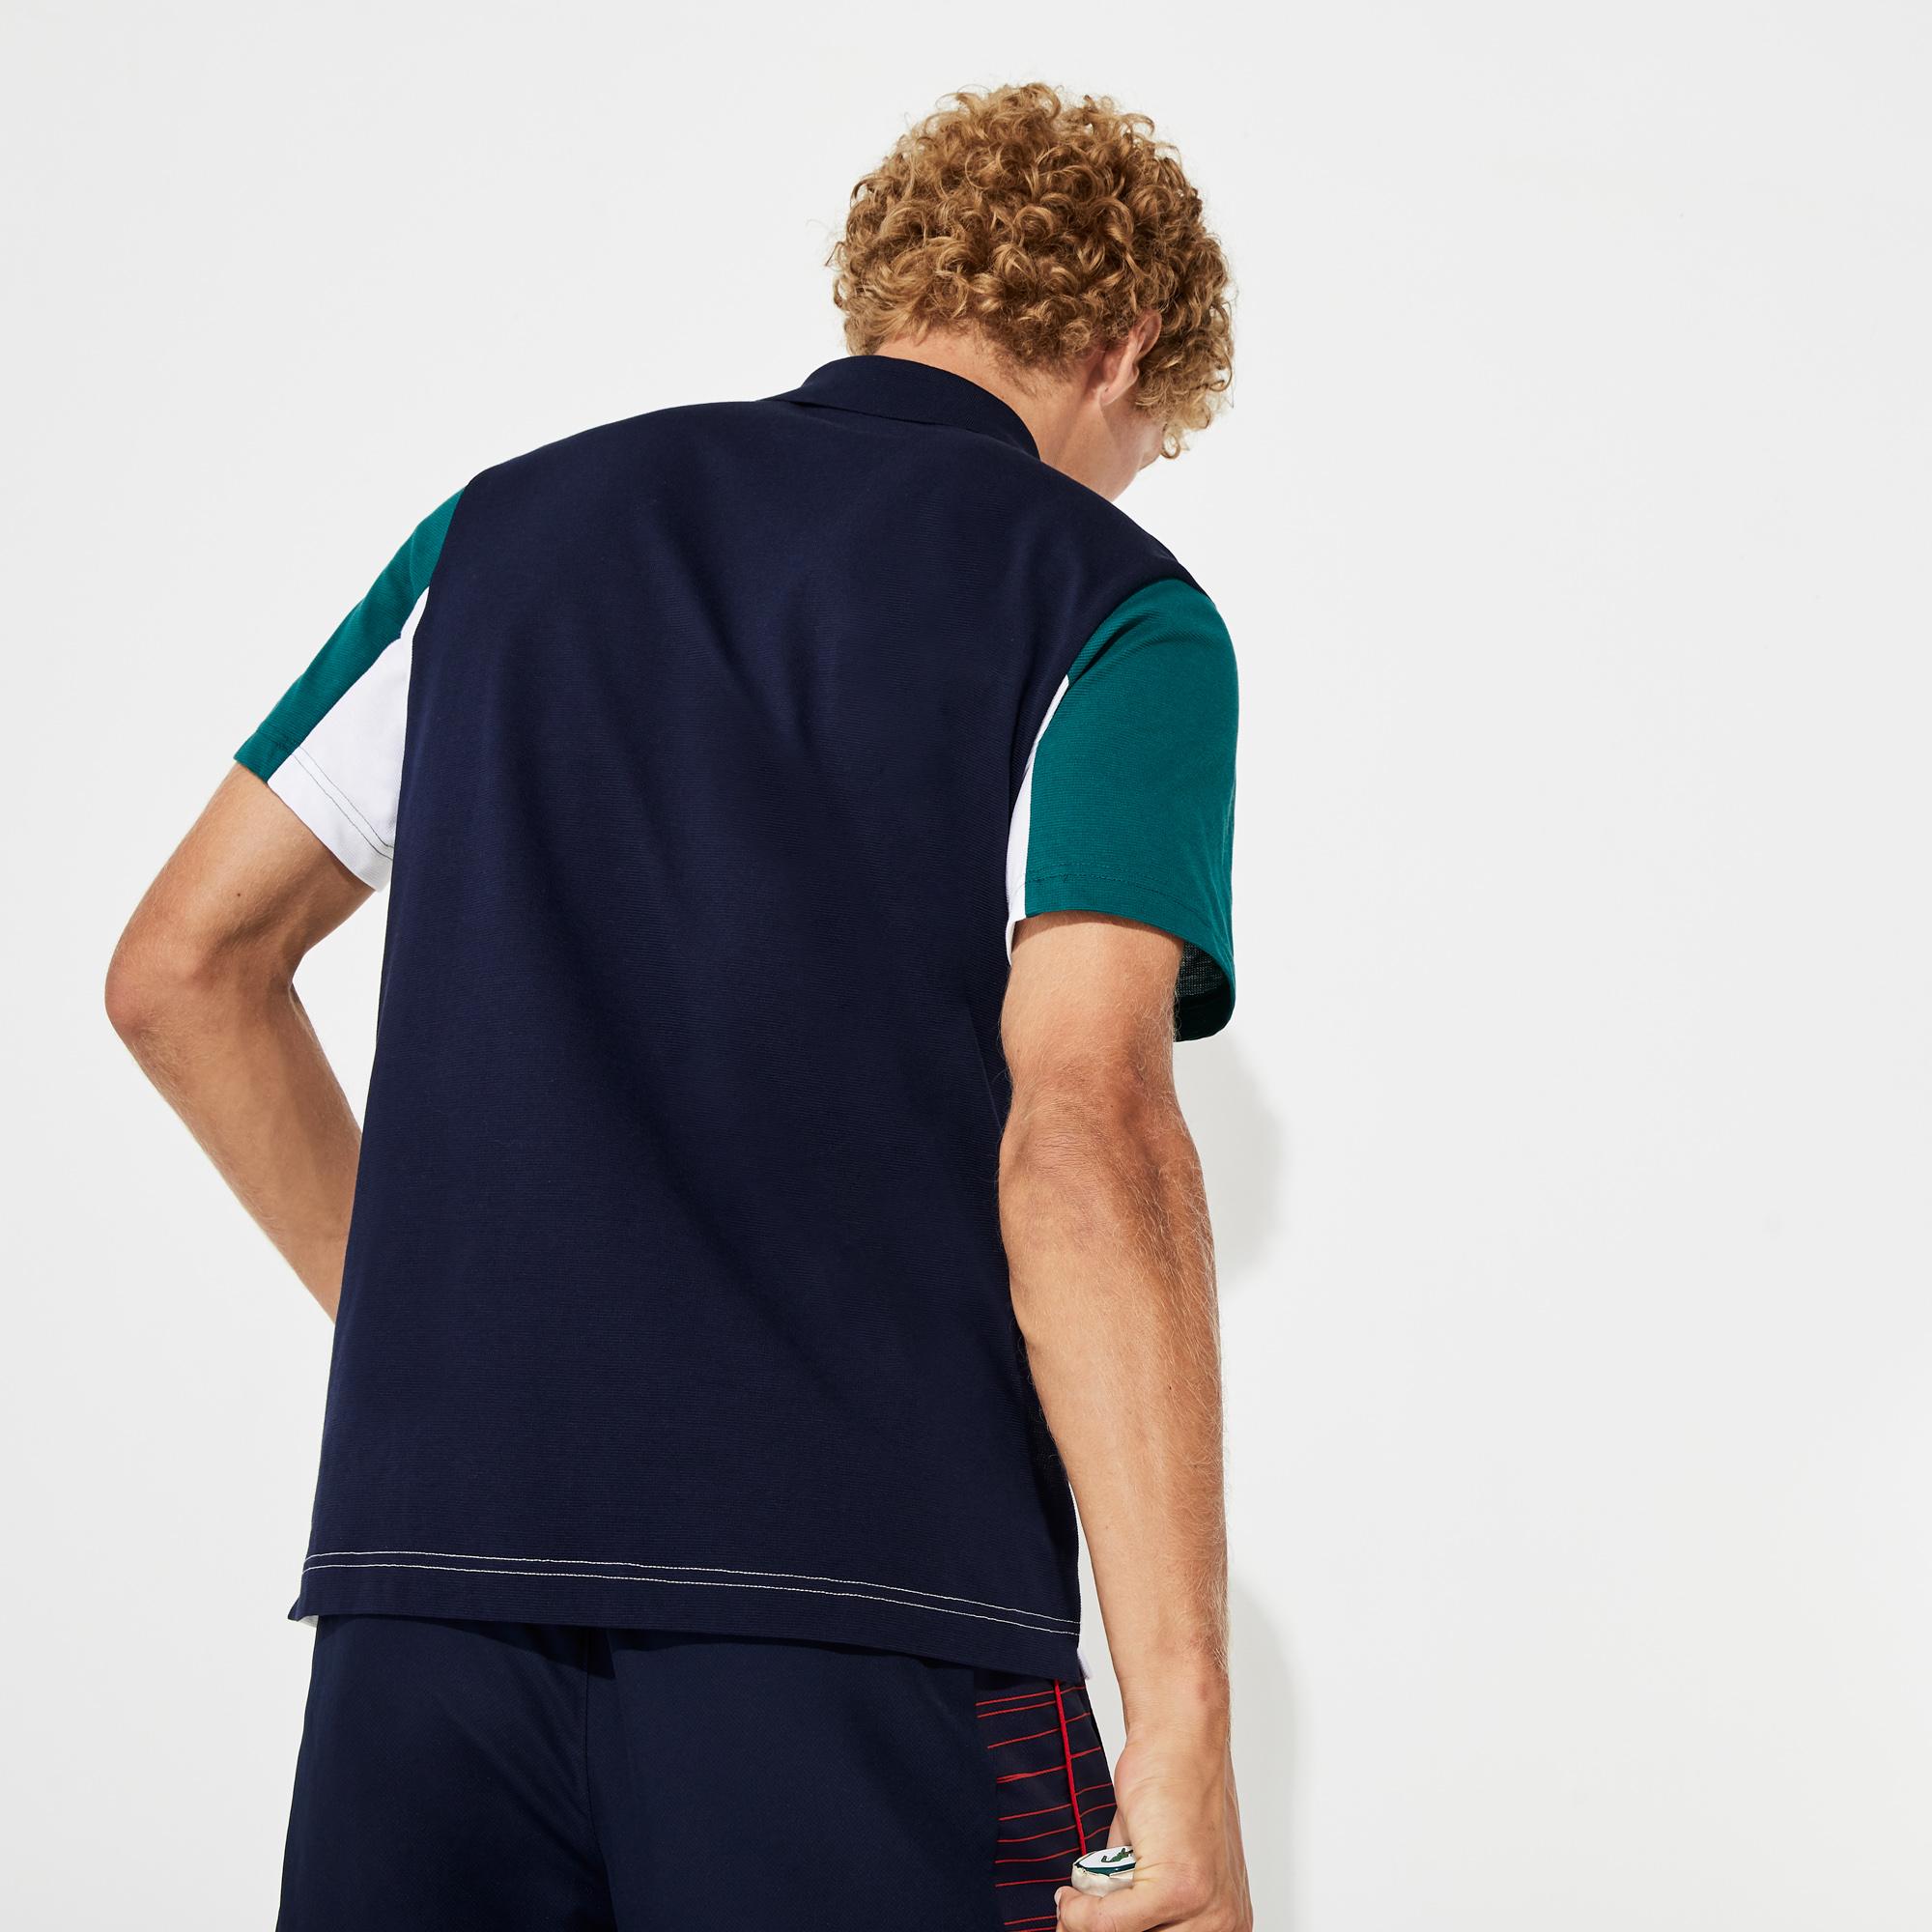 Áo Polo Lacoste SPORT Ultra-Light Colourblock (Trắng/Navy/Green)